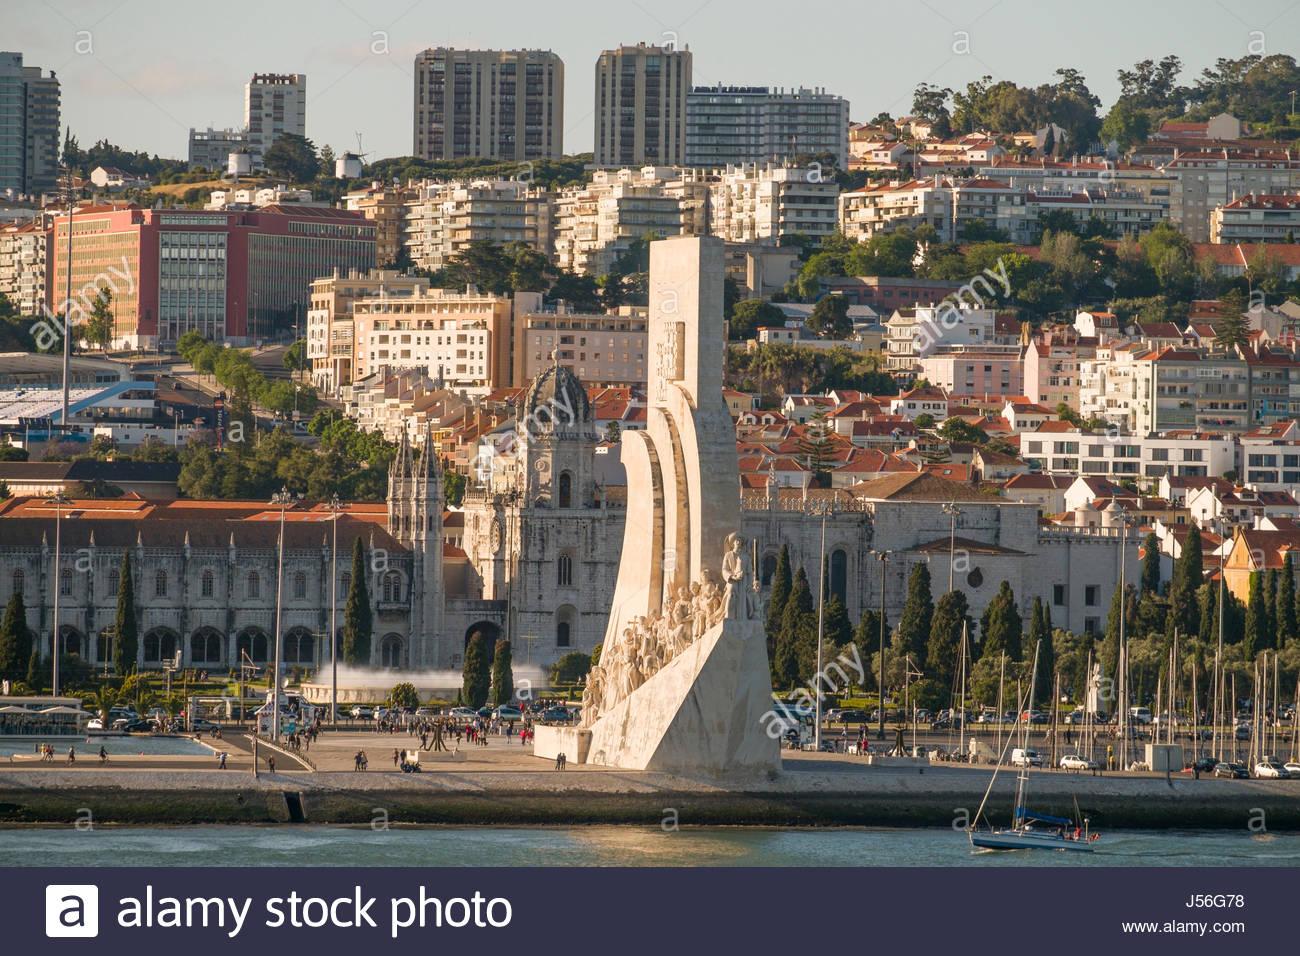 Monument to the Discoveries, Tagus River, Santa Maria de Belém, Lisbon, Lisboa Region, Portugal - Stock Image